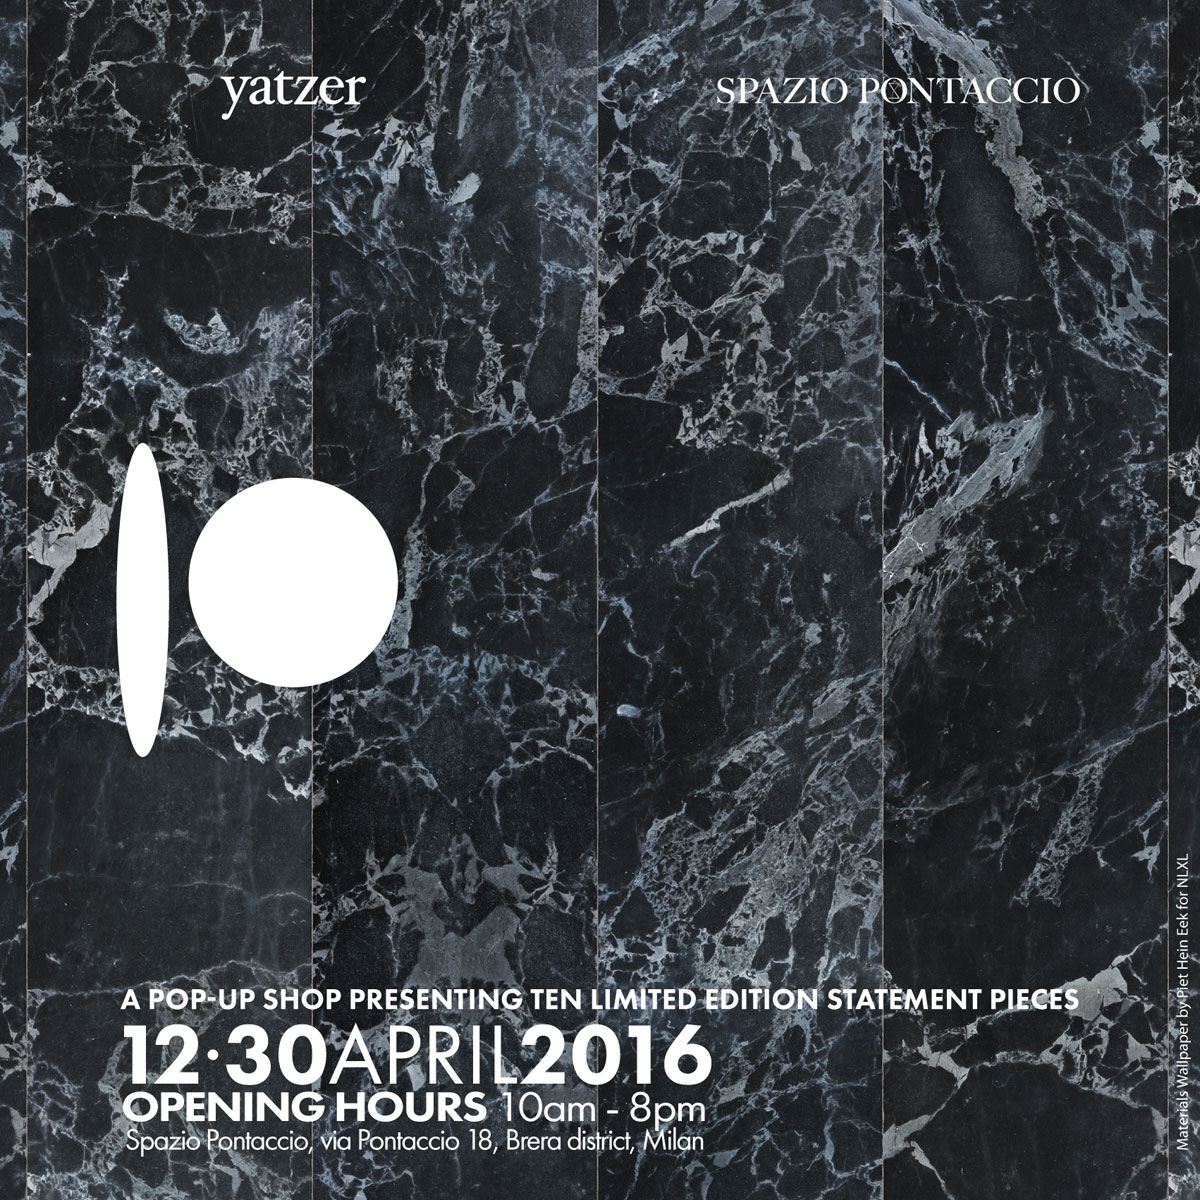 #10byYatzer @ Spazio Pontaccio.